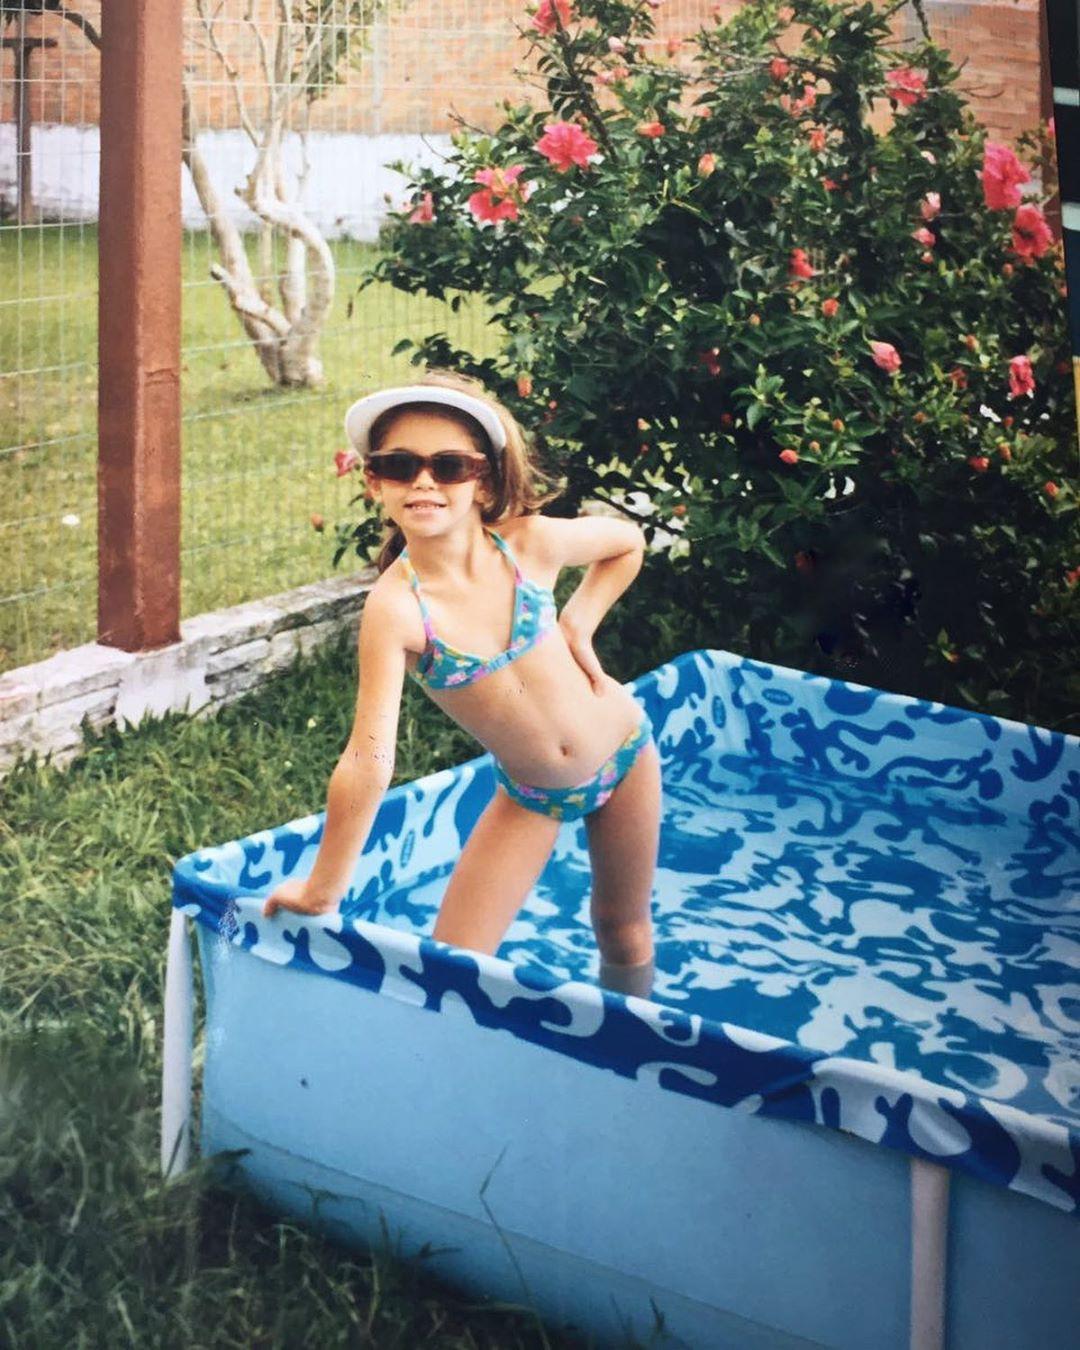 electric blue dresses ideas with bikini, sexy legs, sunglasses, eyewear